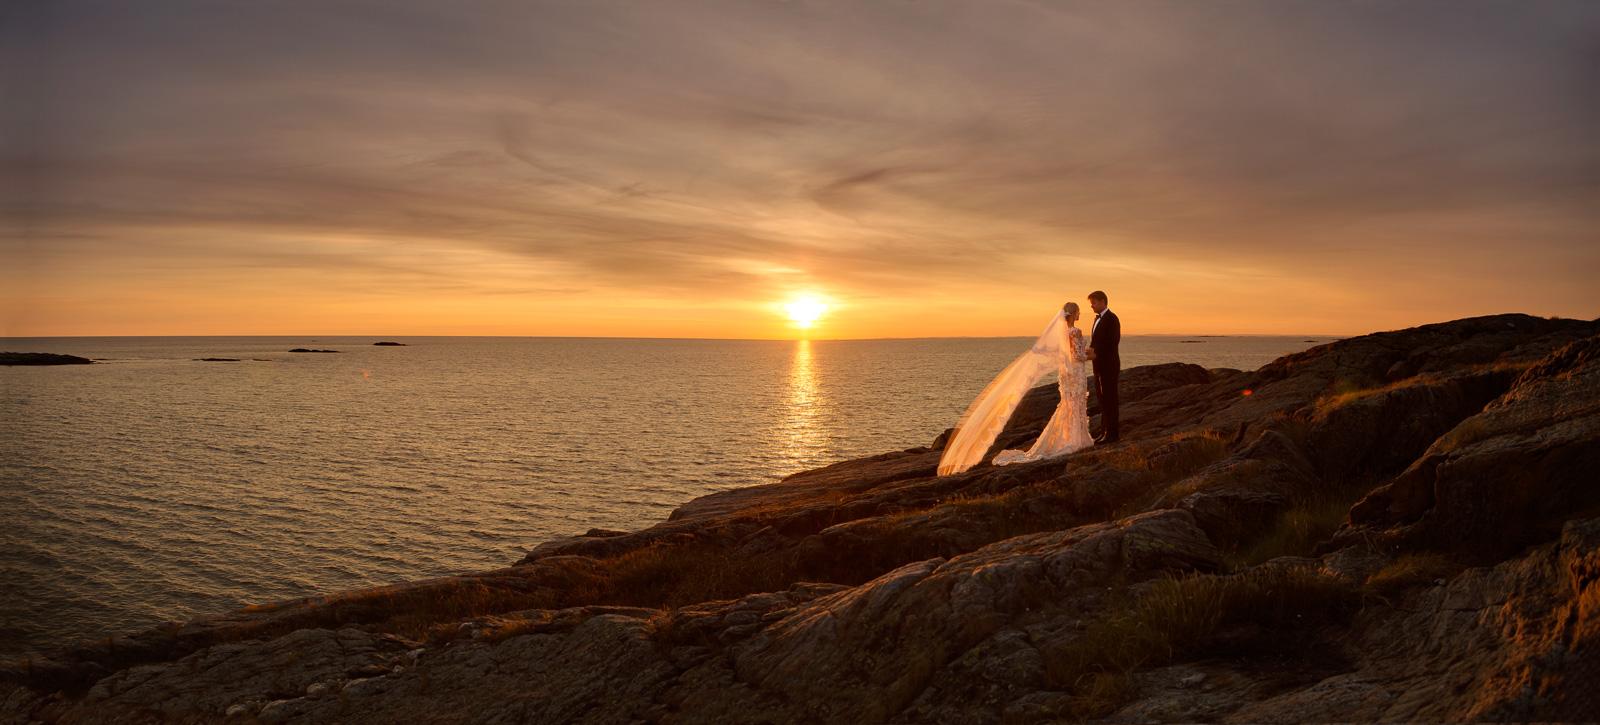 70 Støtvig hotel bryllup